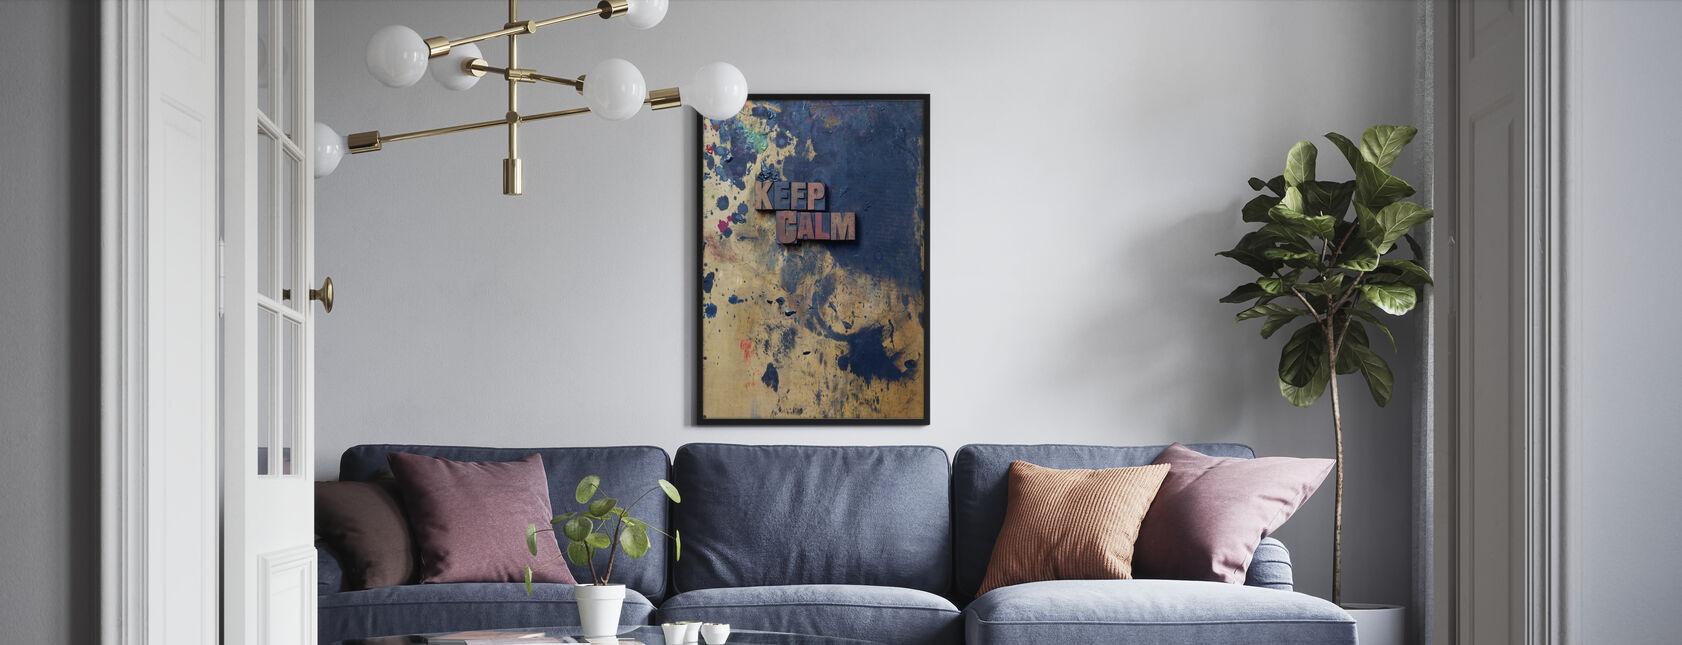 Keep Calm - Framed print - Living Room